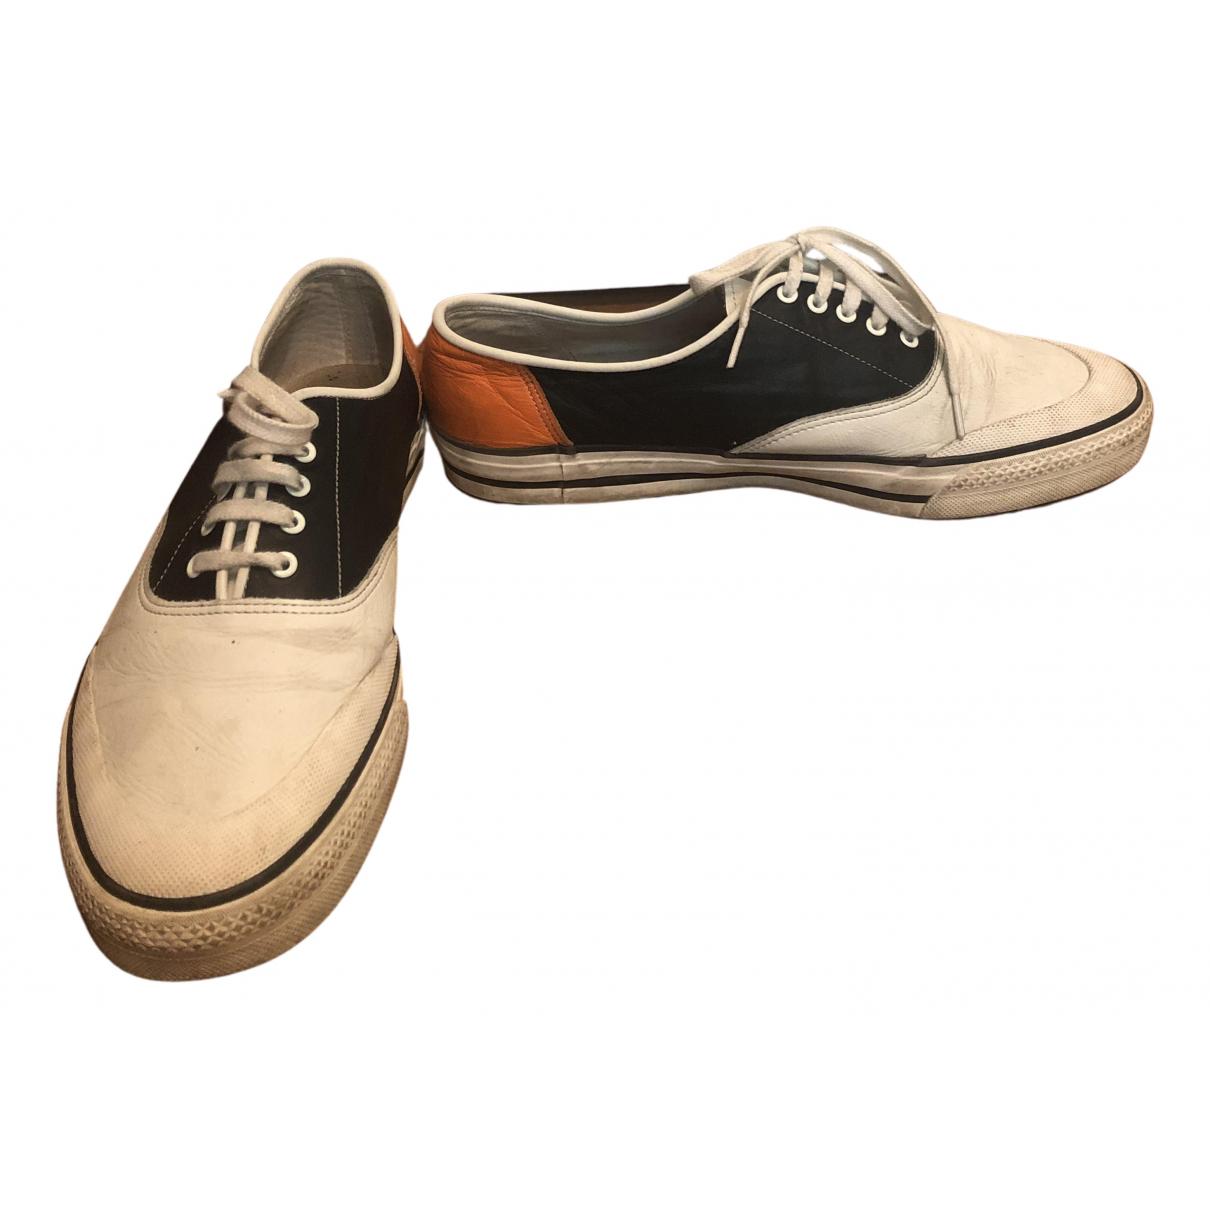 Comme Des Garcons \N Sneakers in  Weiss Leder